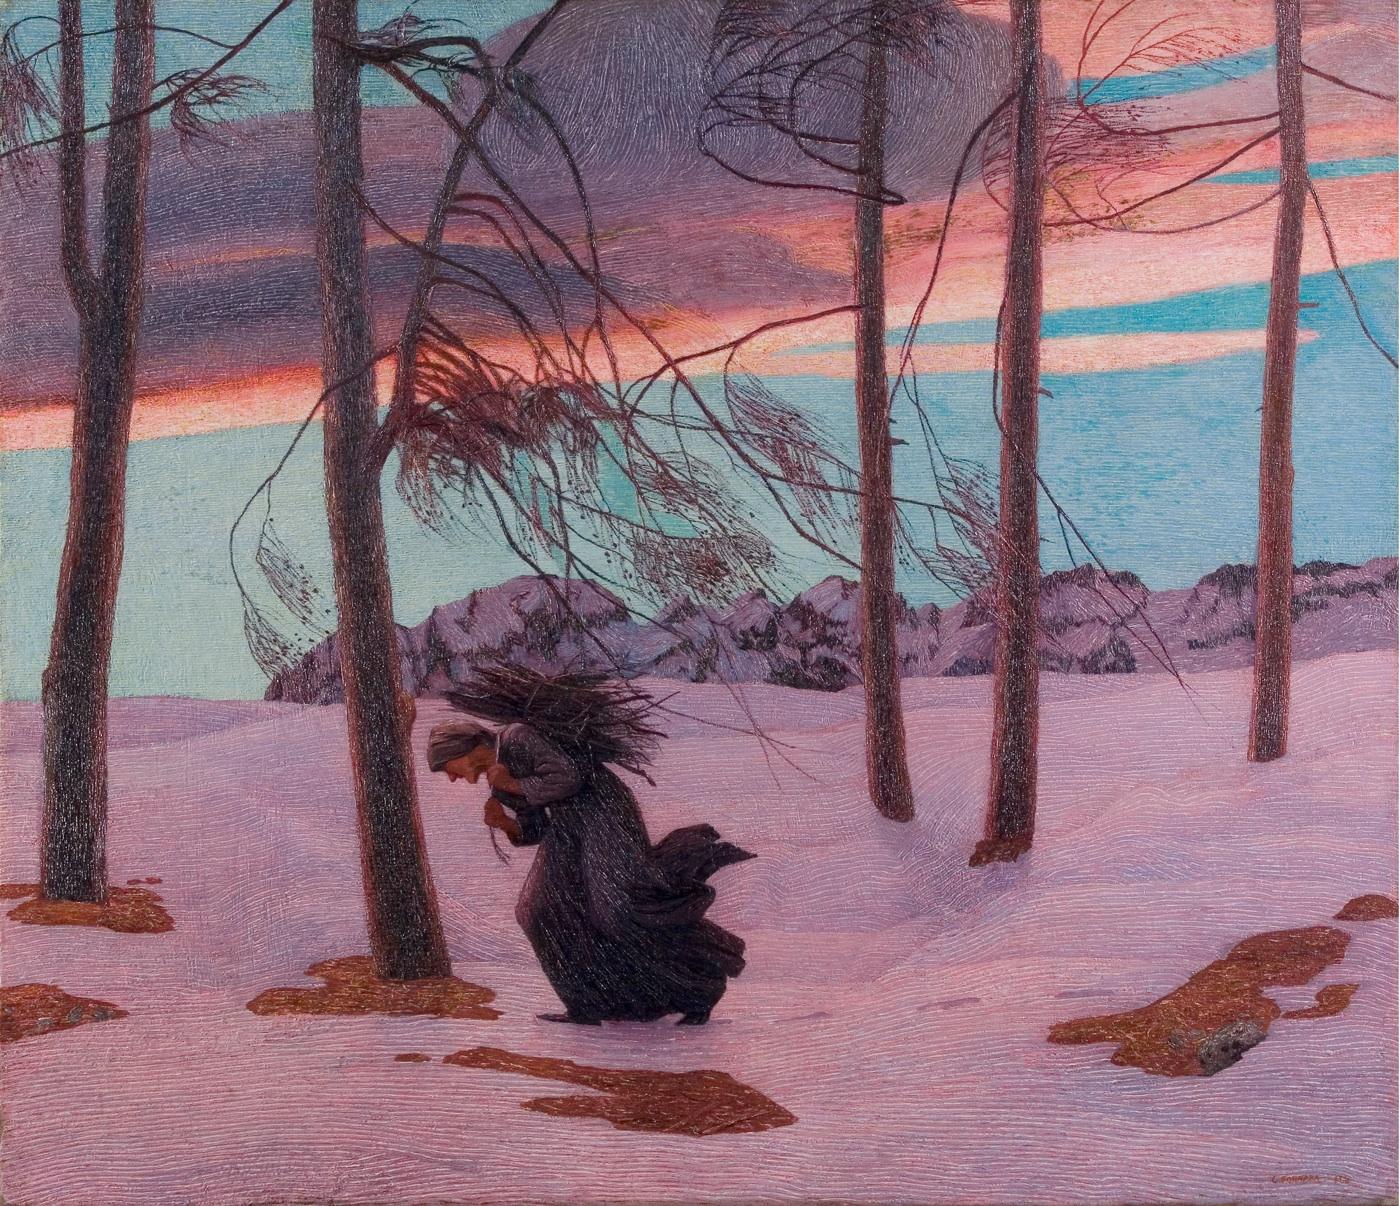 Carlo Fornara, L'Aquilone, olio su tela 135 x 154 cm